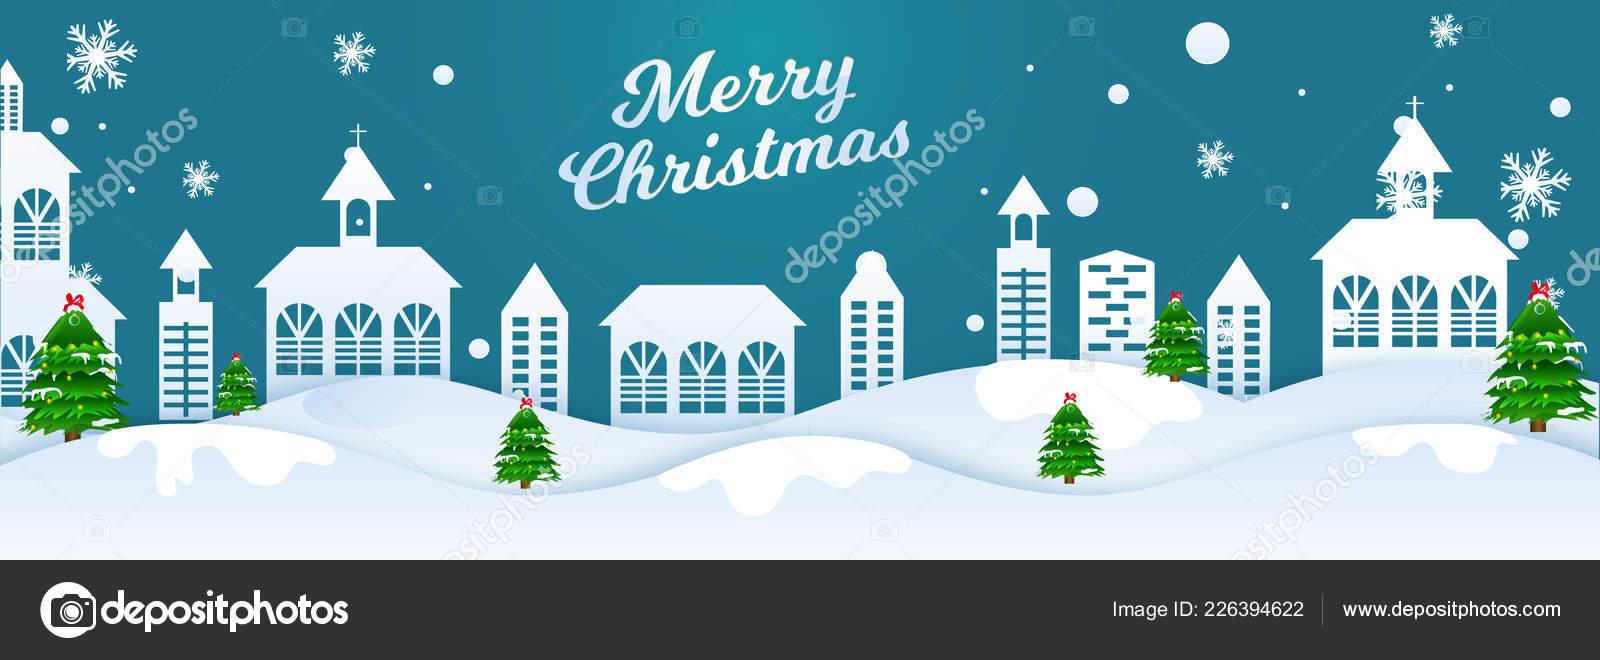 merry christmas header banner design paper cut style winter